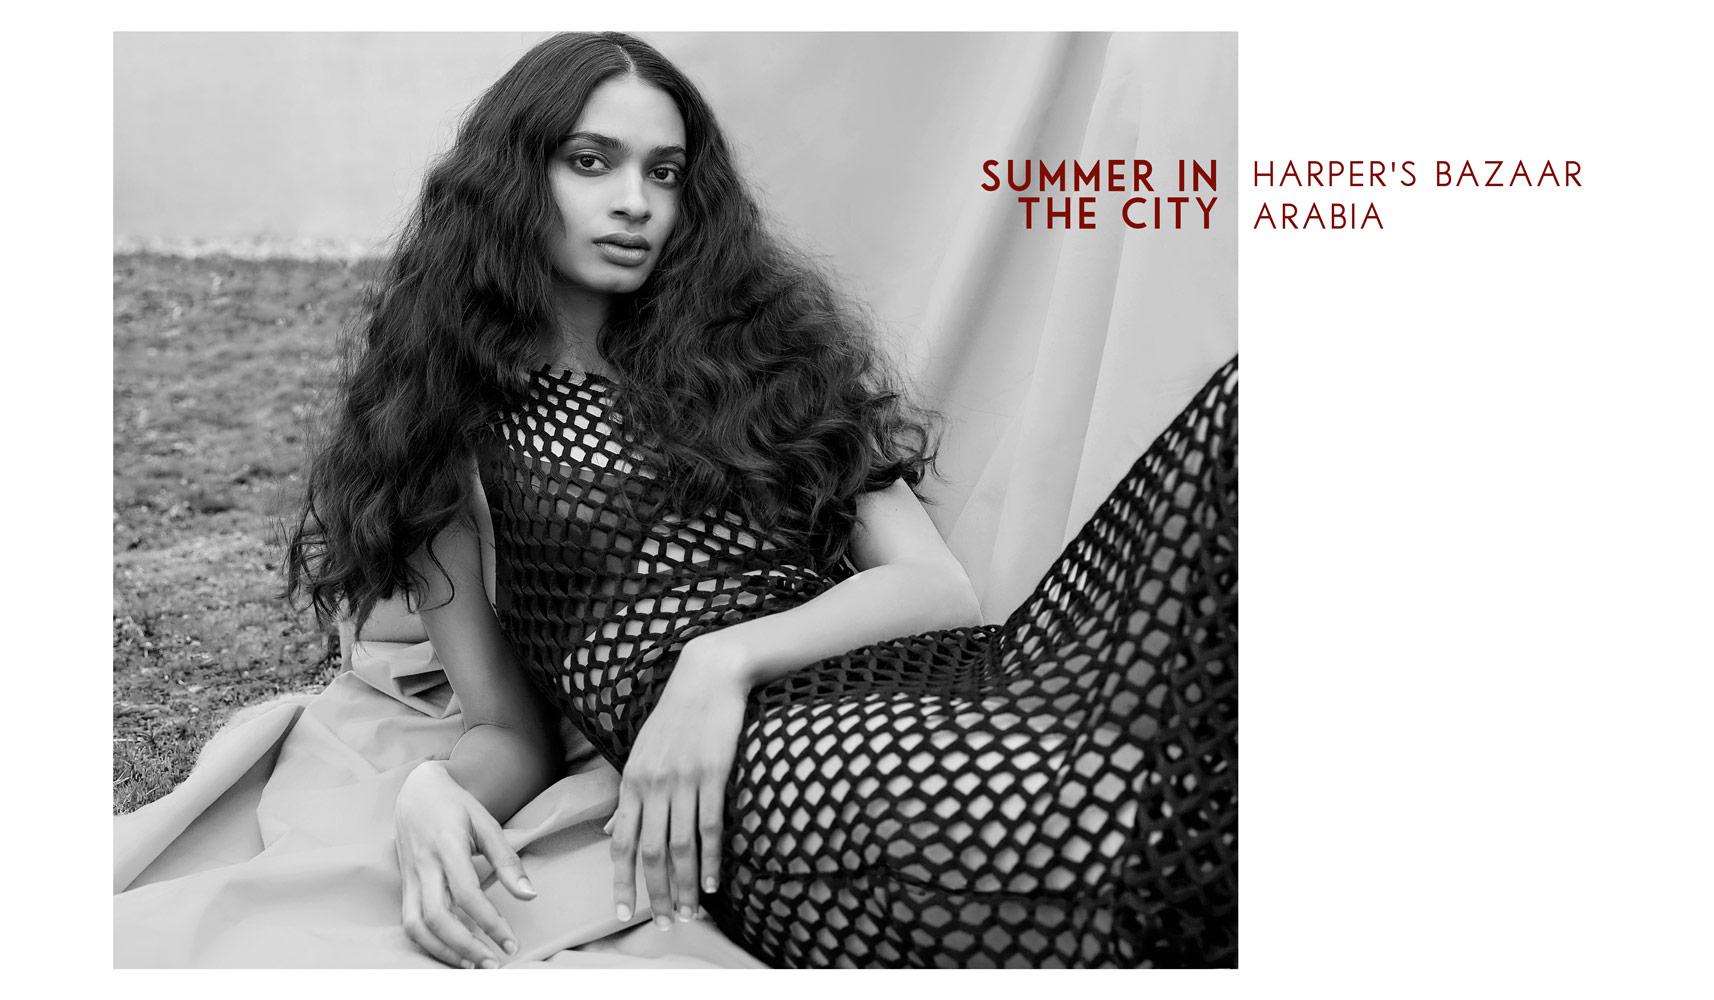 Harper's Bazaar Arabia July/August -Summer in the City –